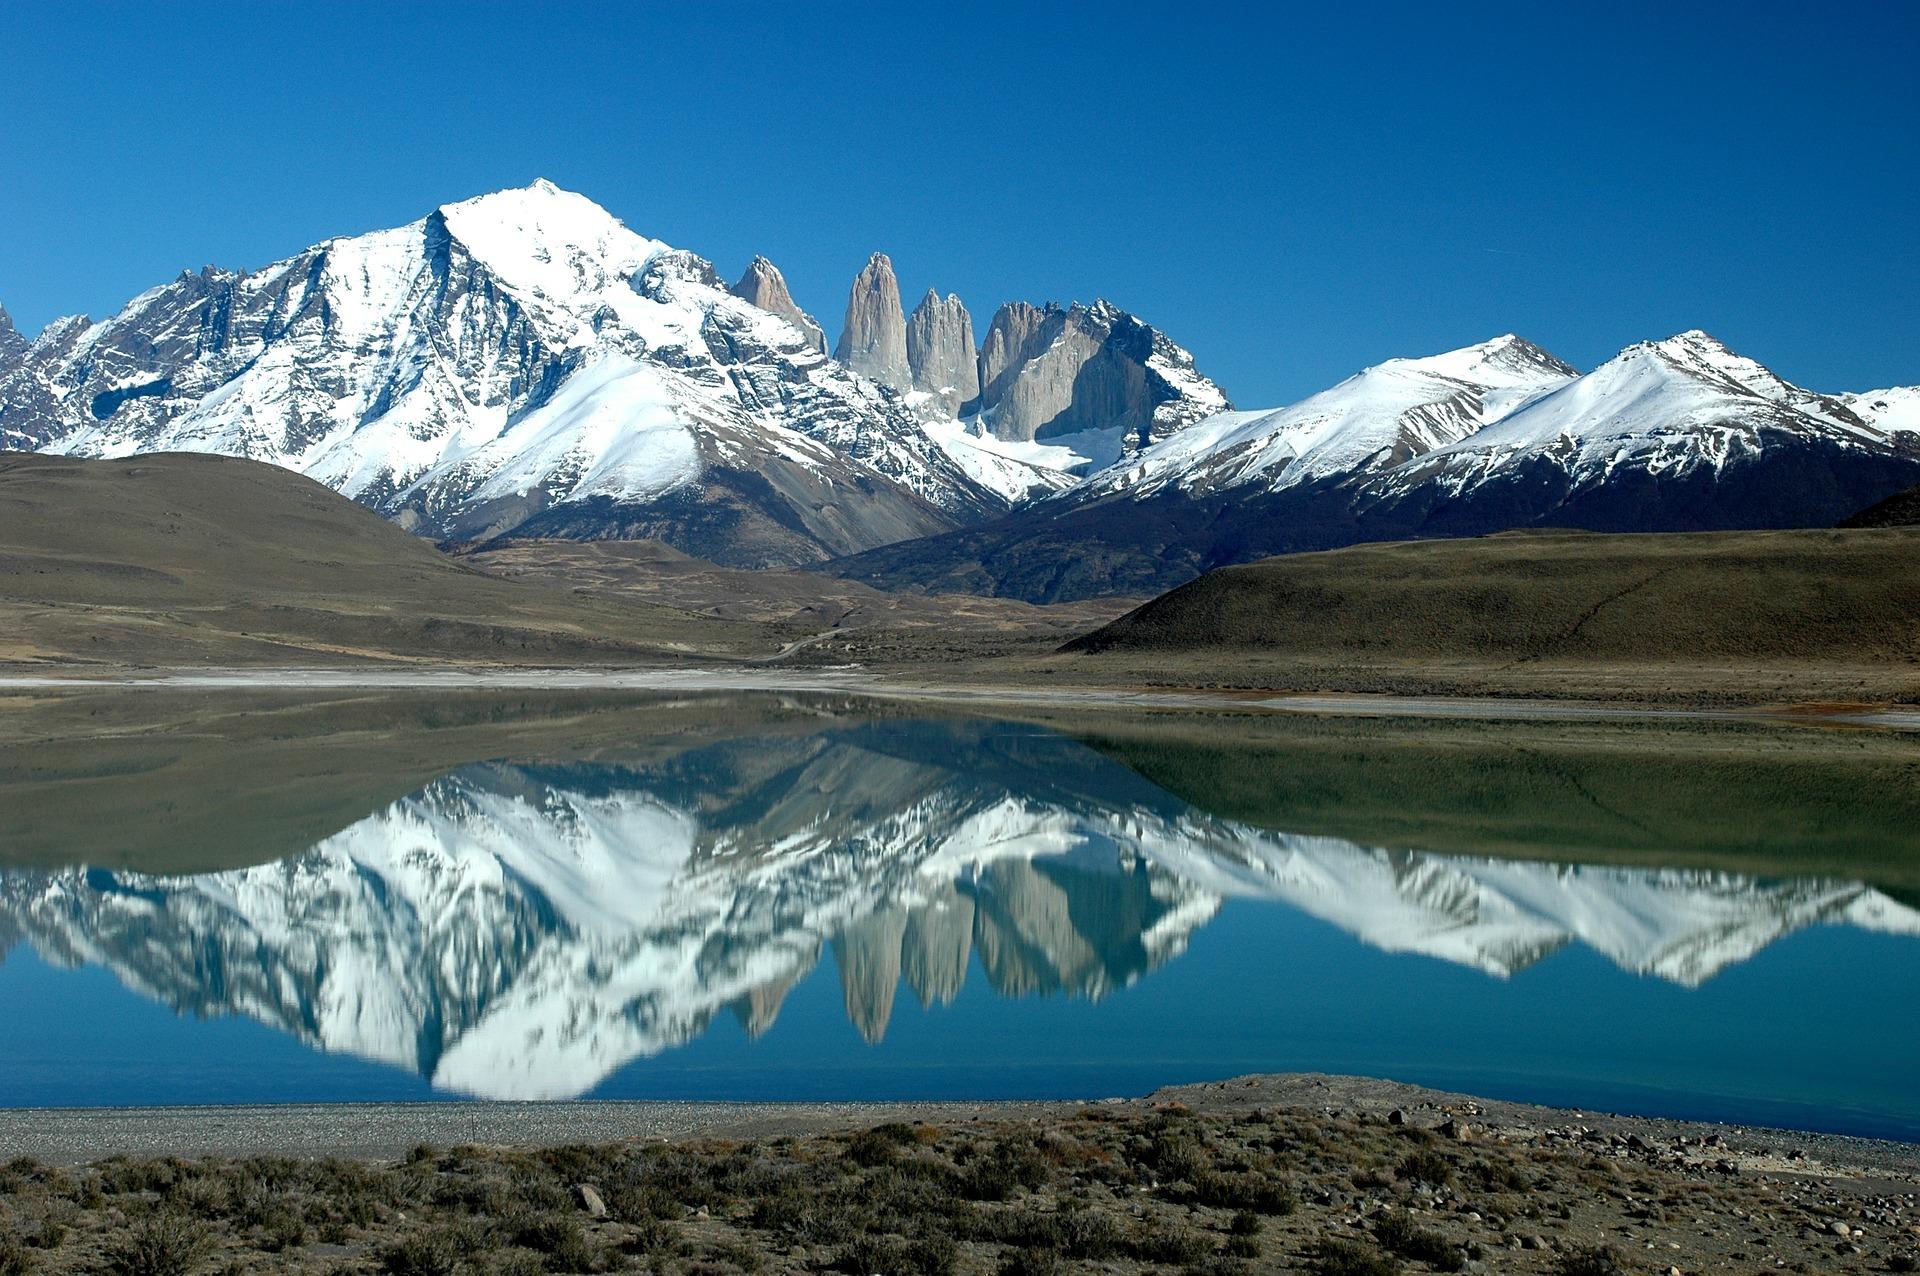 patagonia-588085_1920